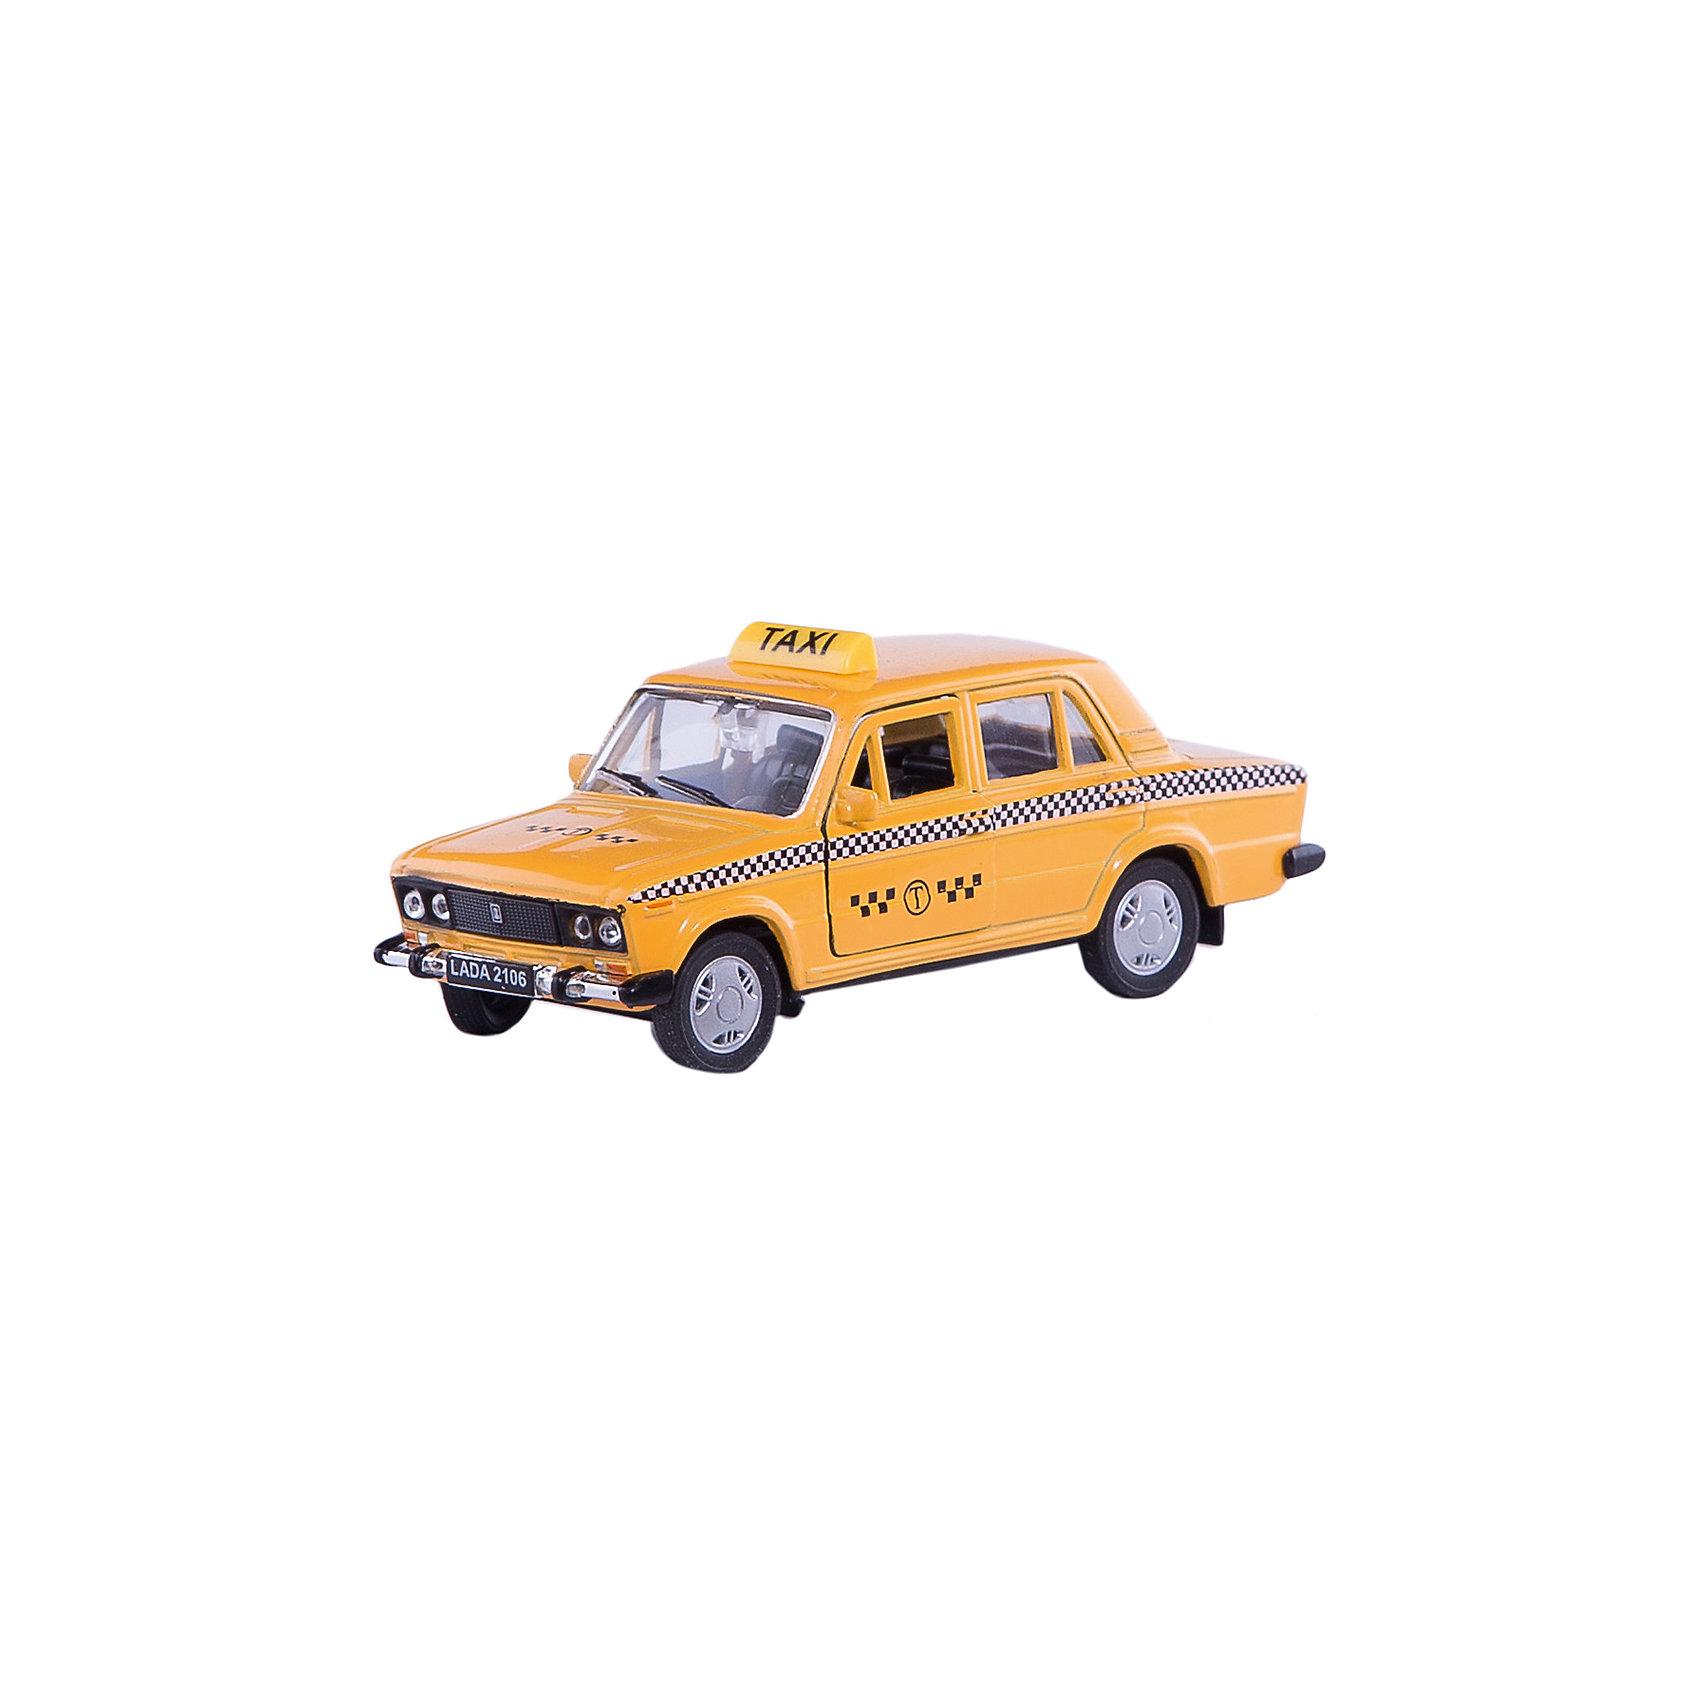 Welly Welly Модель машины 1:34-39 LADA 2106 Такси